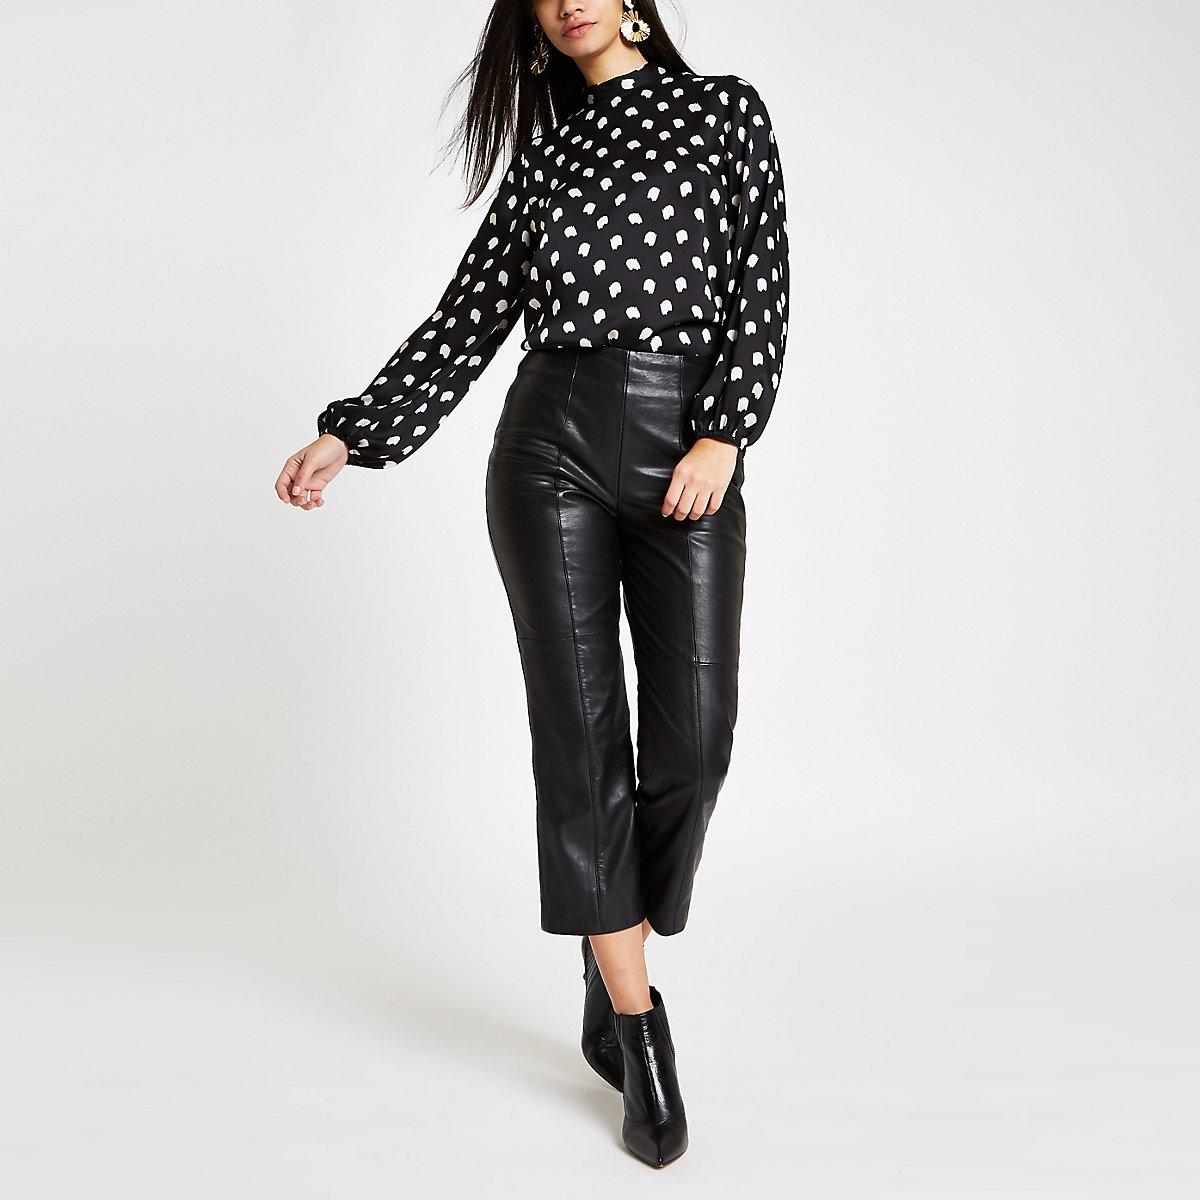 Black spot high neck blouse